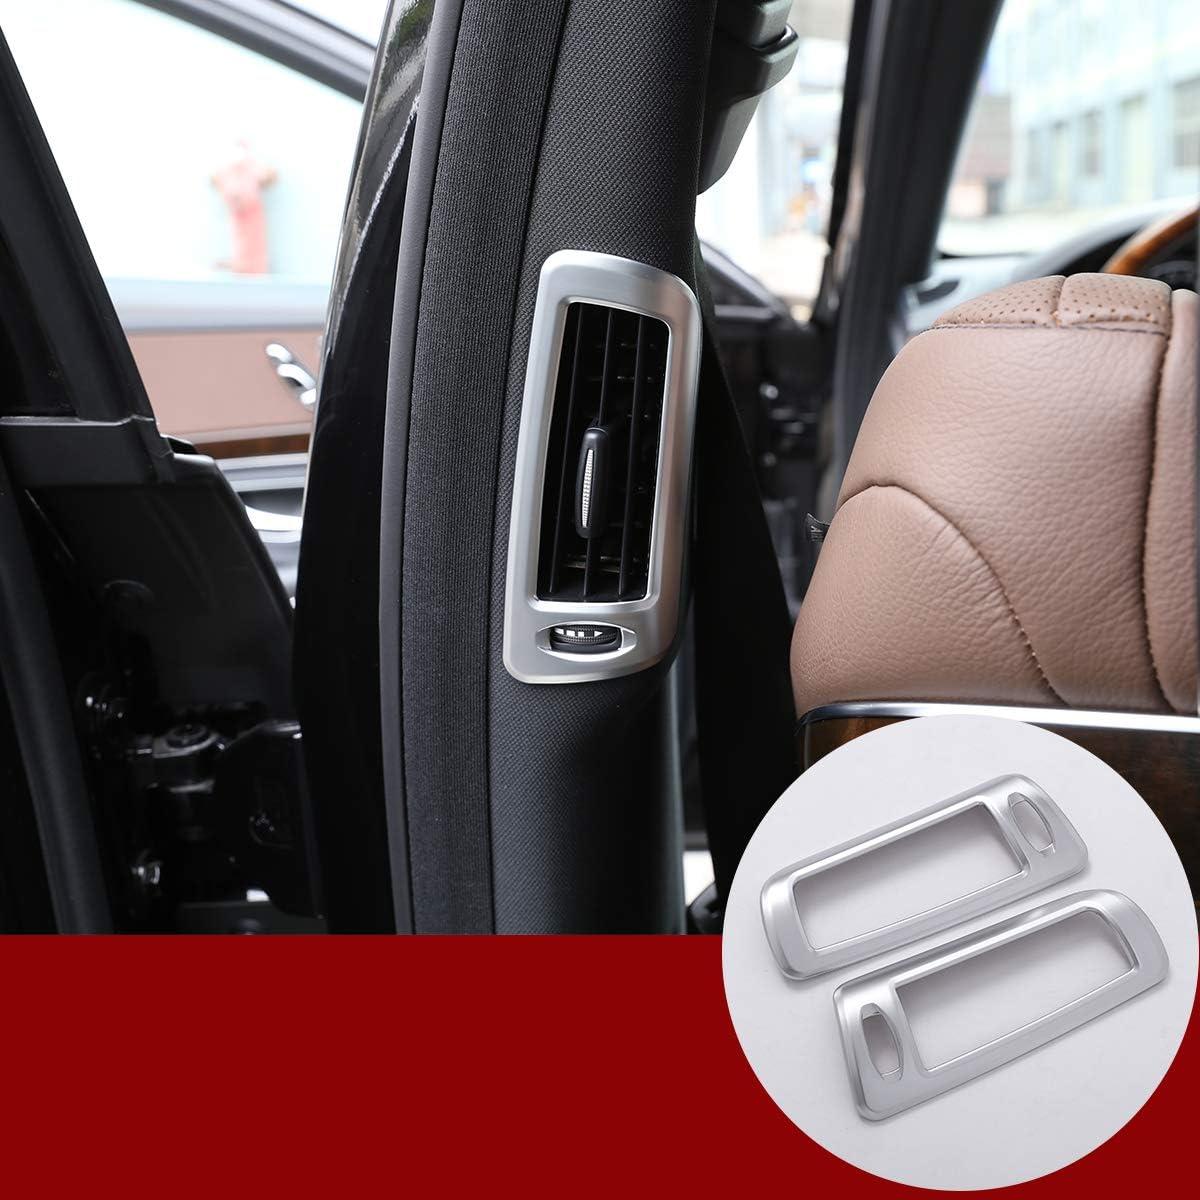 YIWANG ABS Chrome B Pillar Air Conditining Outlet Frame Trim Car Accessories for Mercedes Benz S Class W222 2014-2019